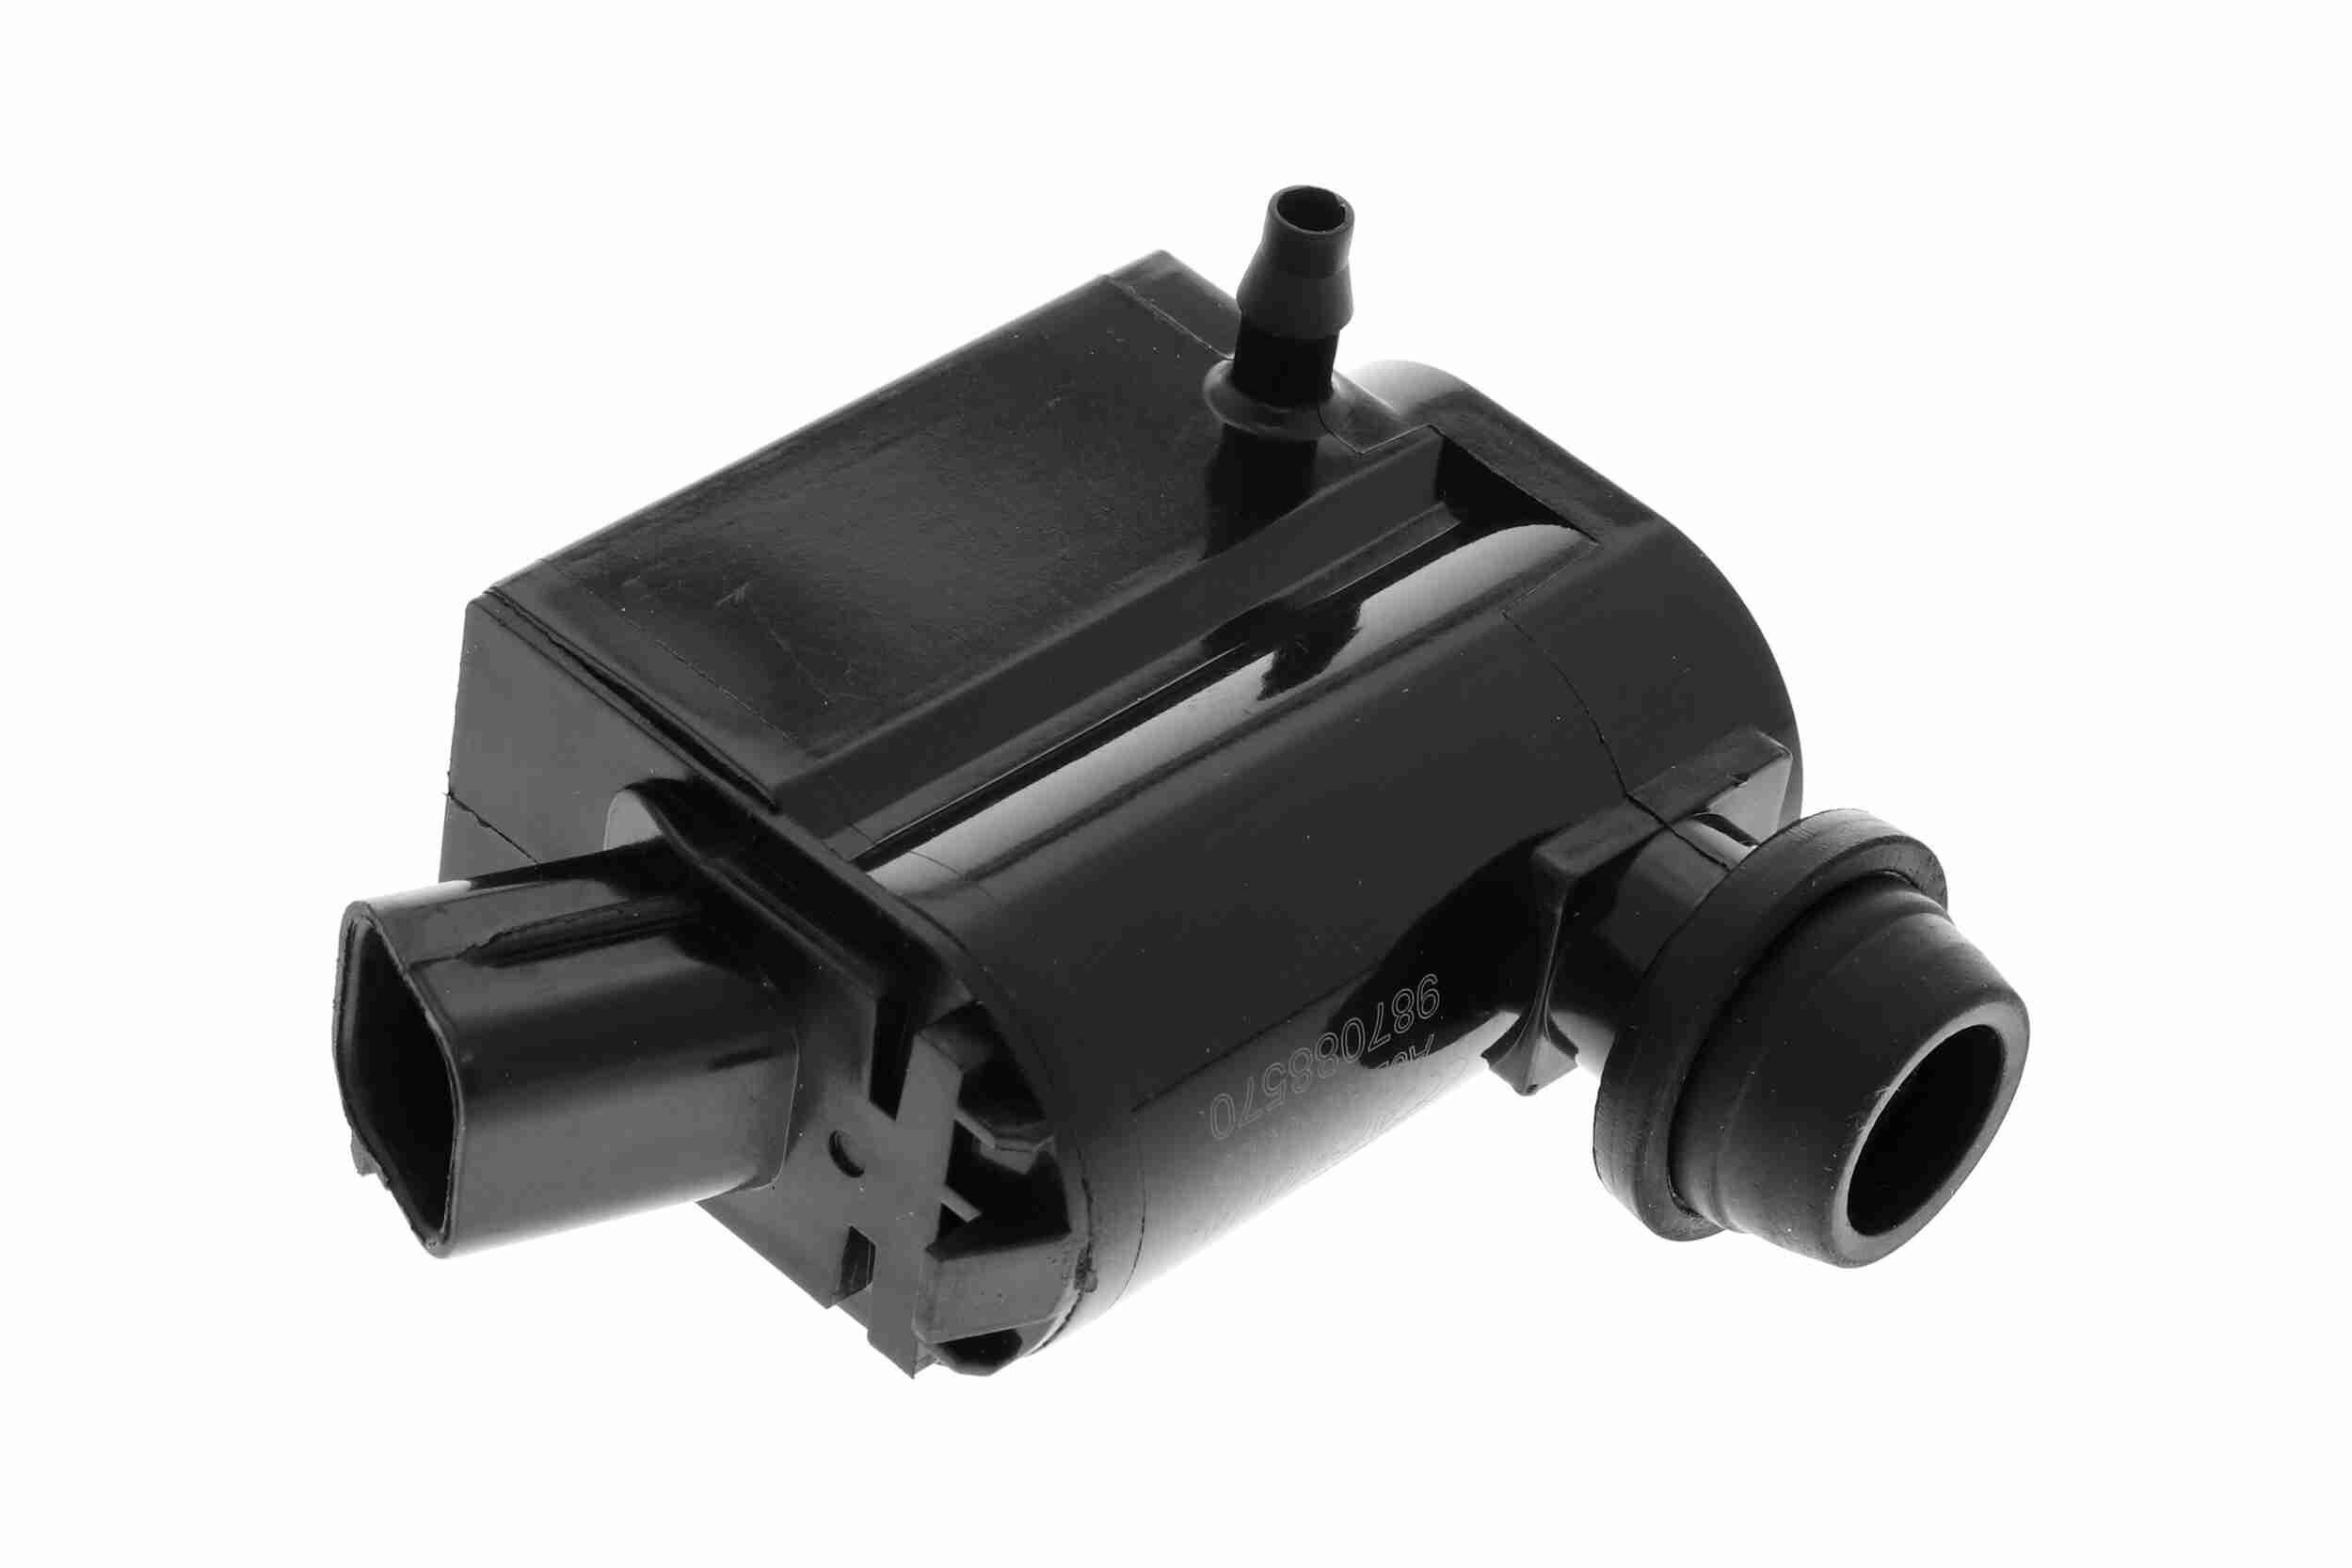 Windshield Washer Pump A52-08-0005 ACKOJA A52-08-0005 original quality